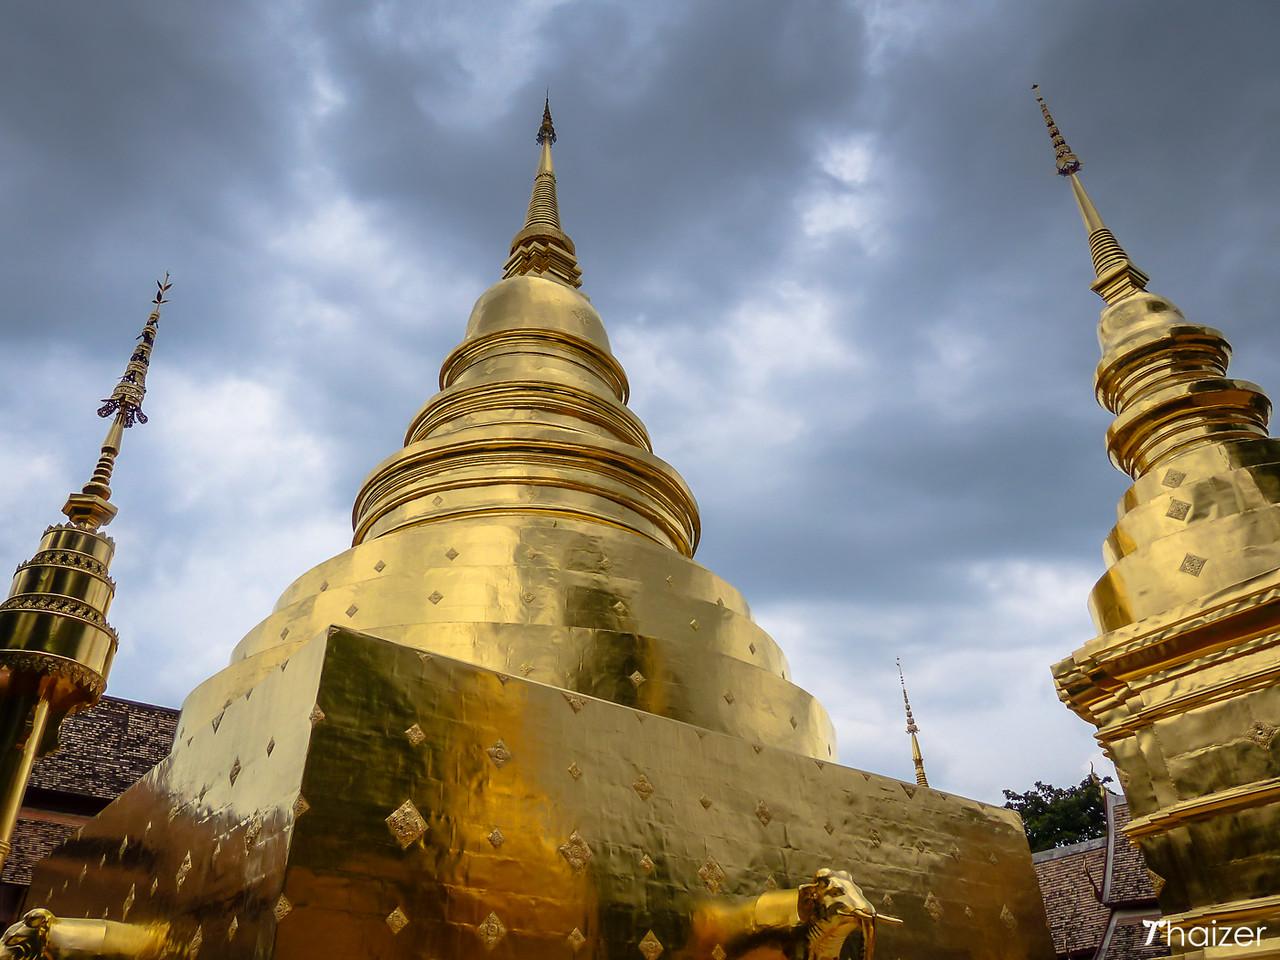 golden chedis at Wat Phra Singh